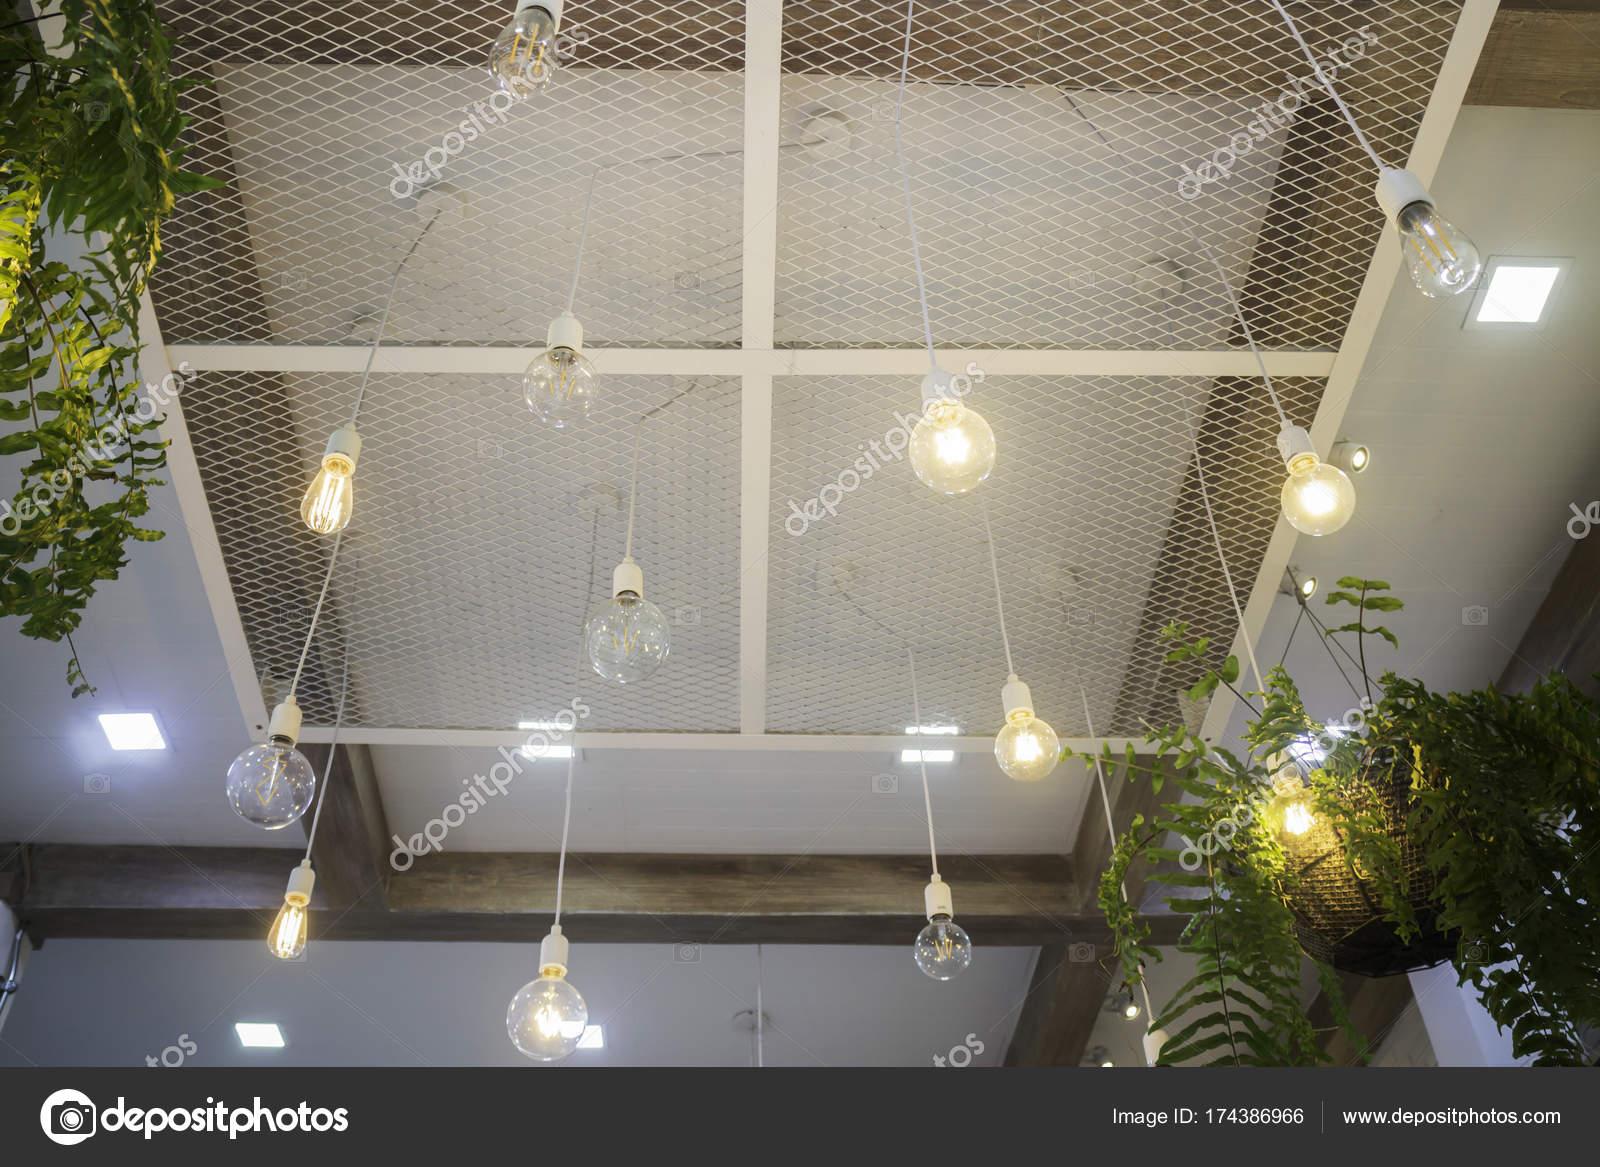 Fern In Plant Pot Hanging On Ceiling Stock Photo C Nalinrat 174386966